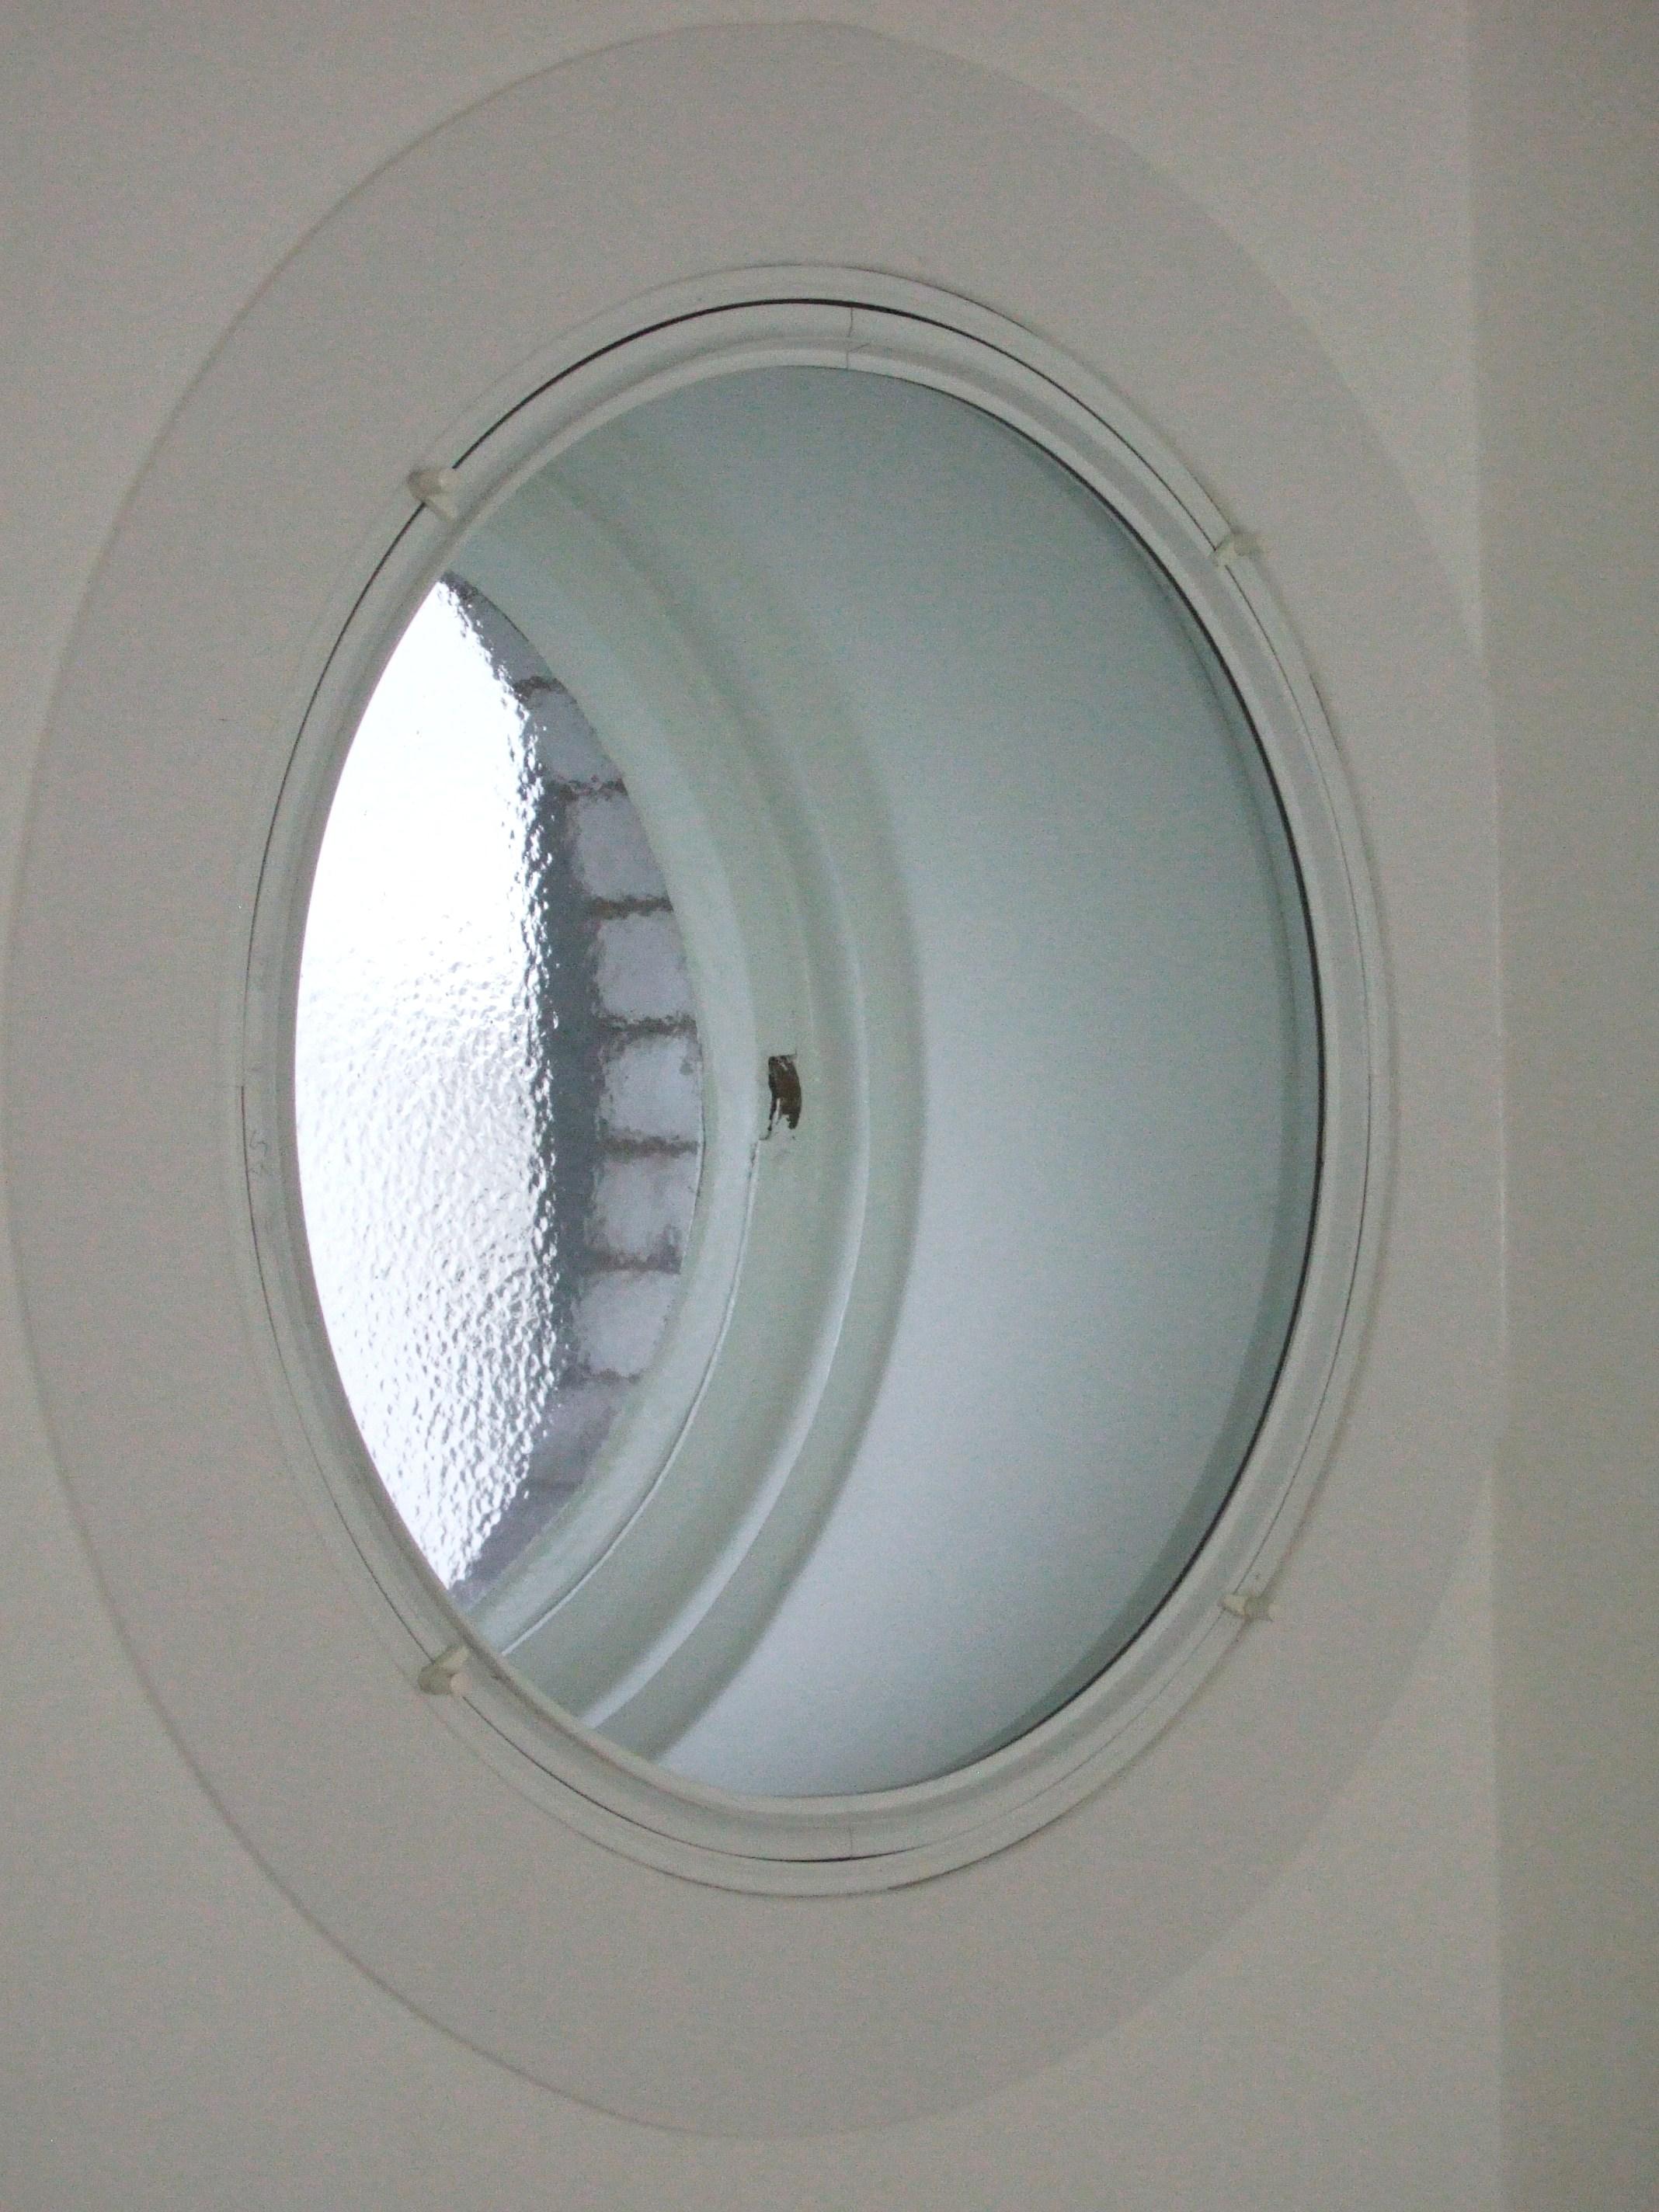 Circular secondary glazing